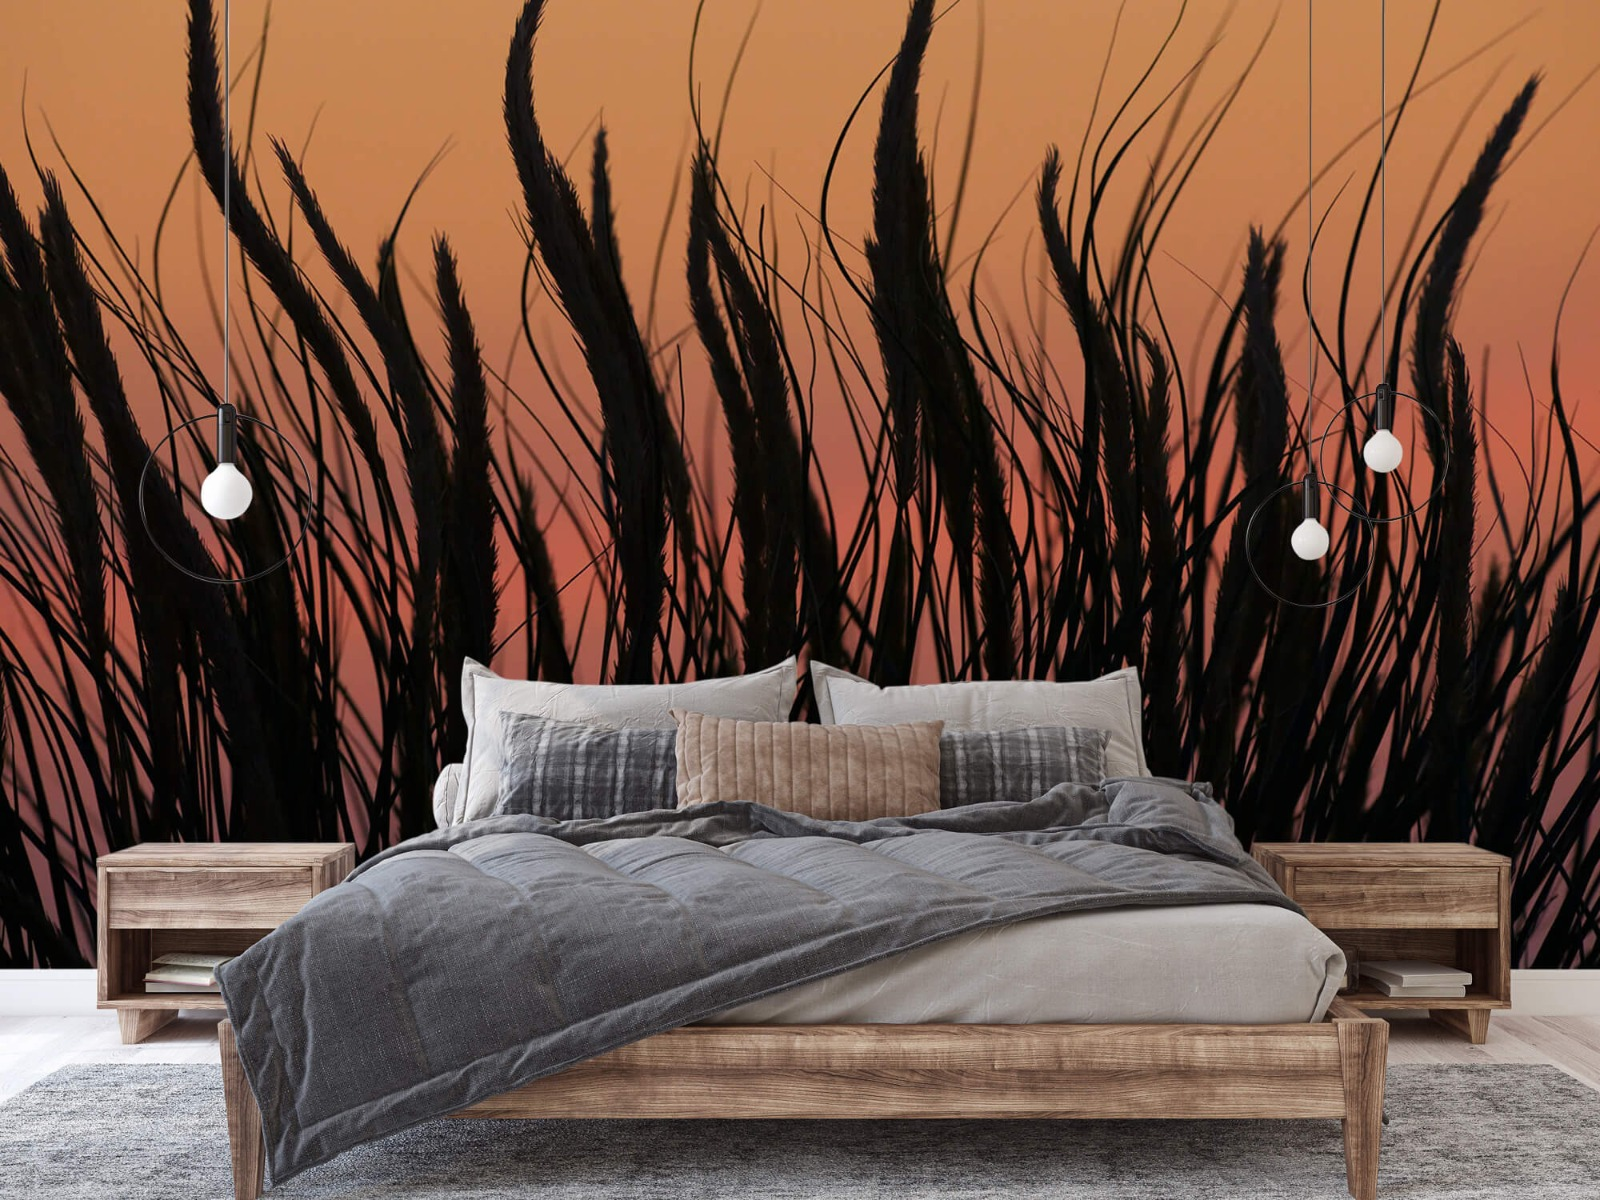 Zomer behang - Helmgras in de avond - Slaapkamer 16